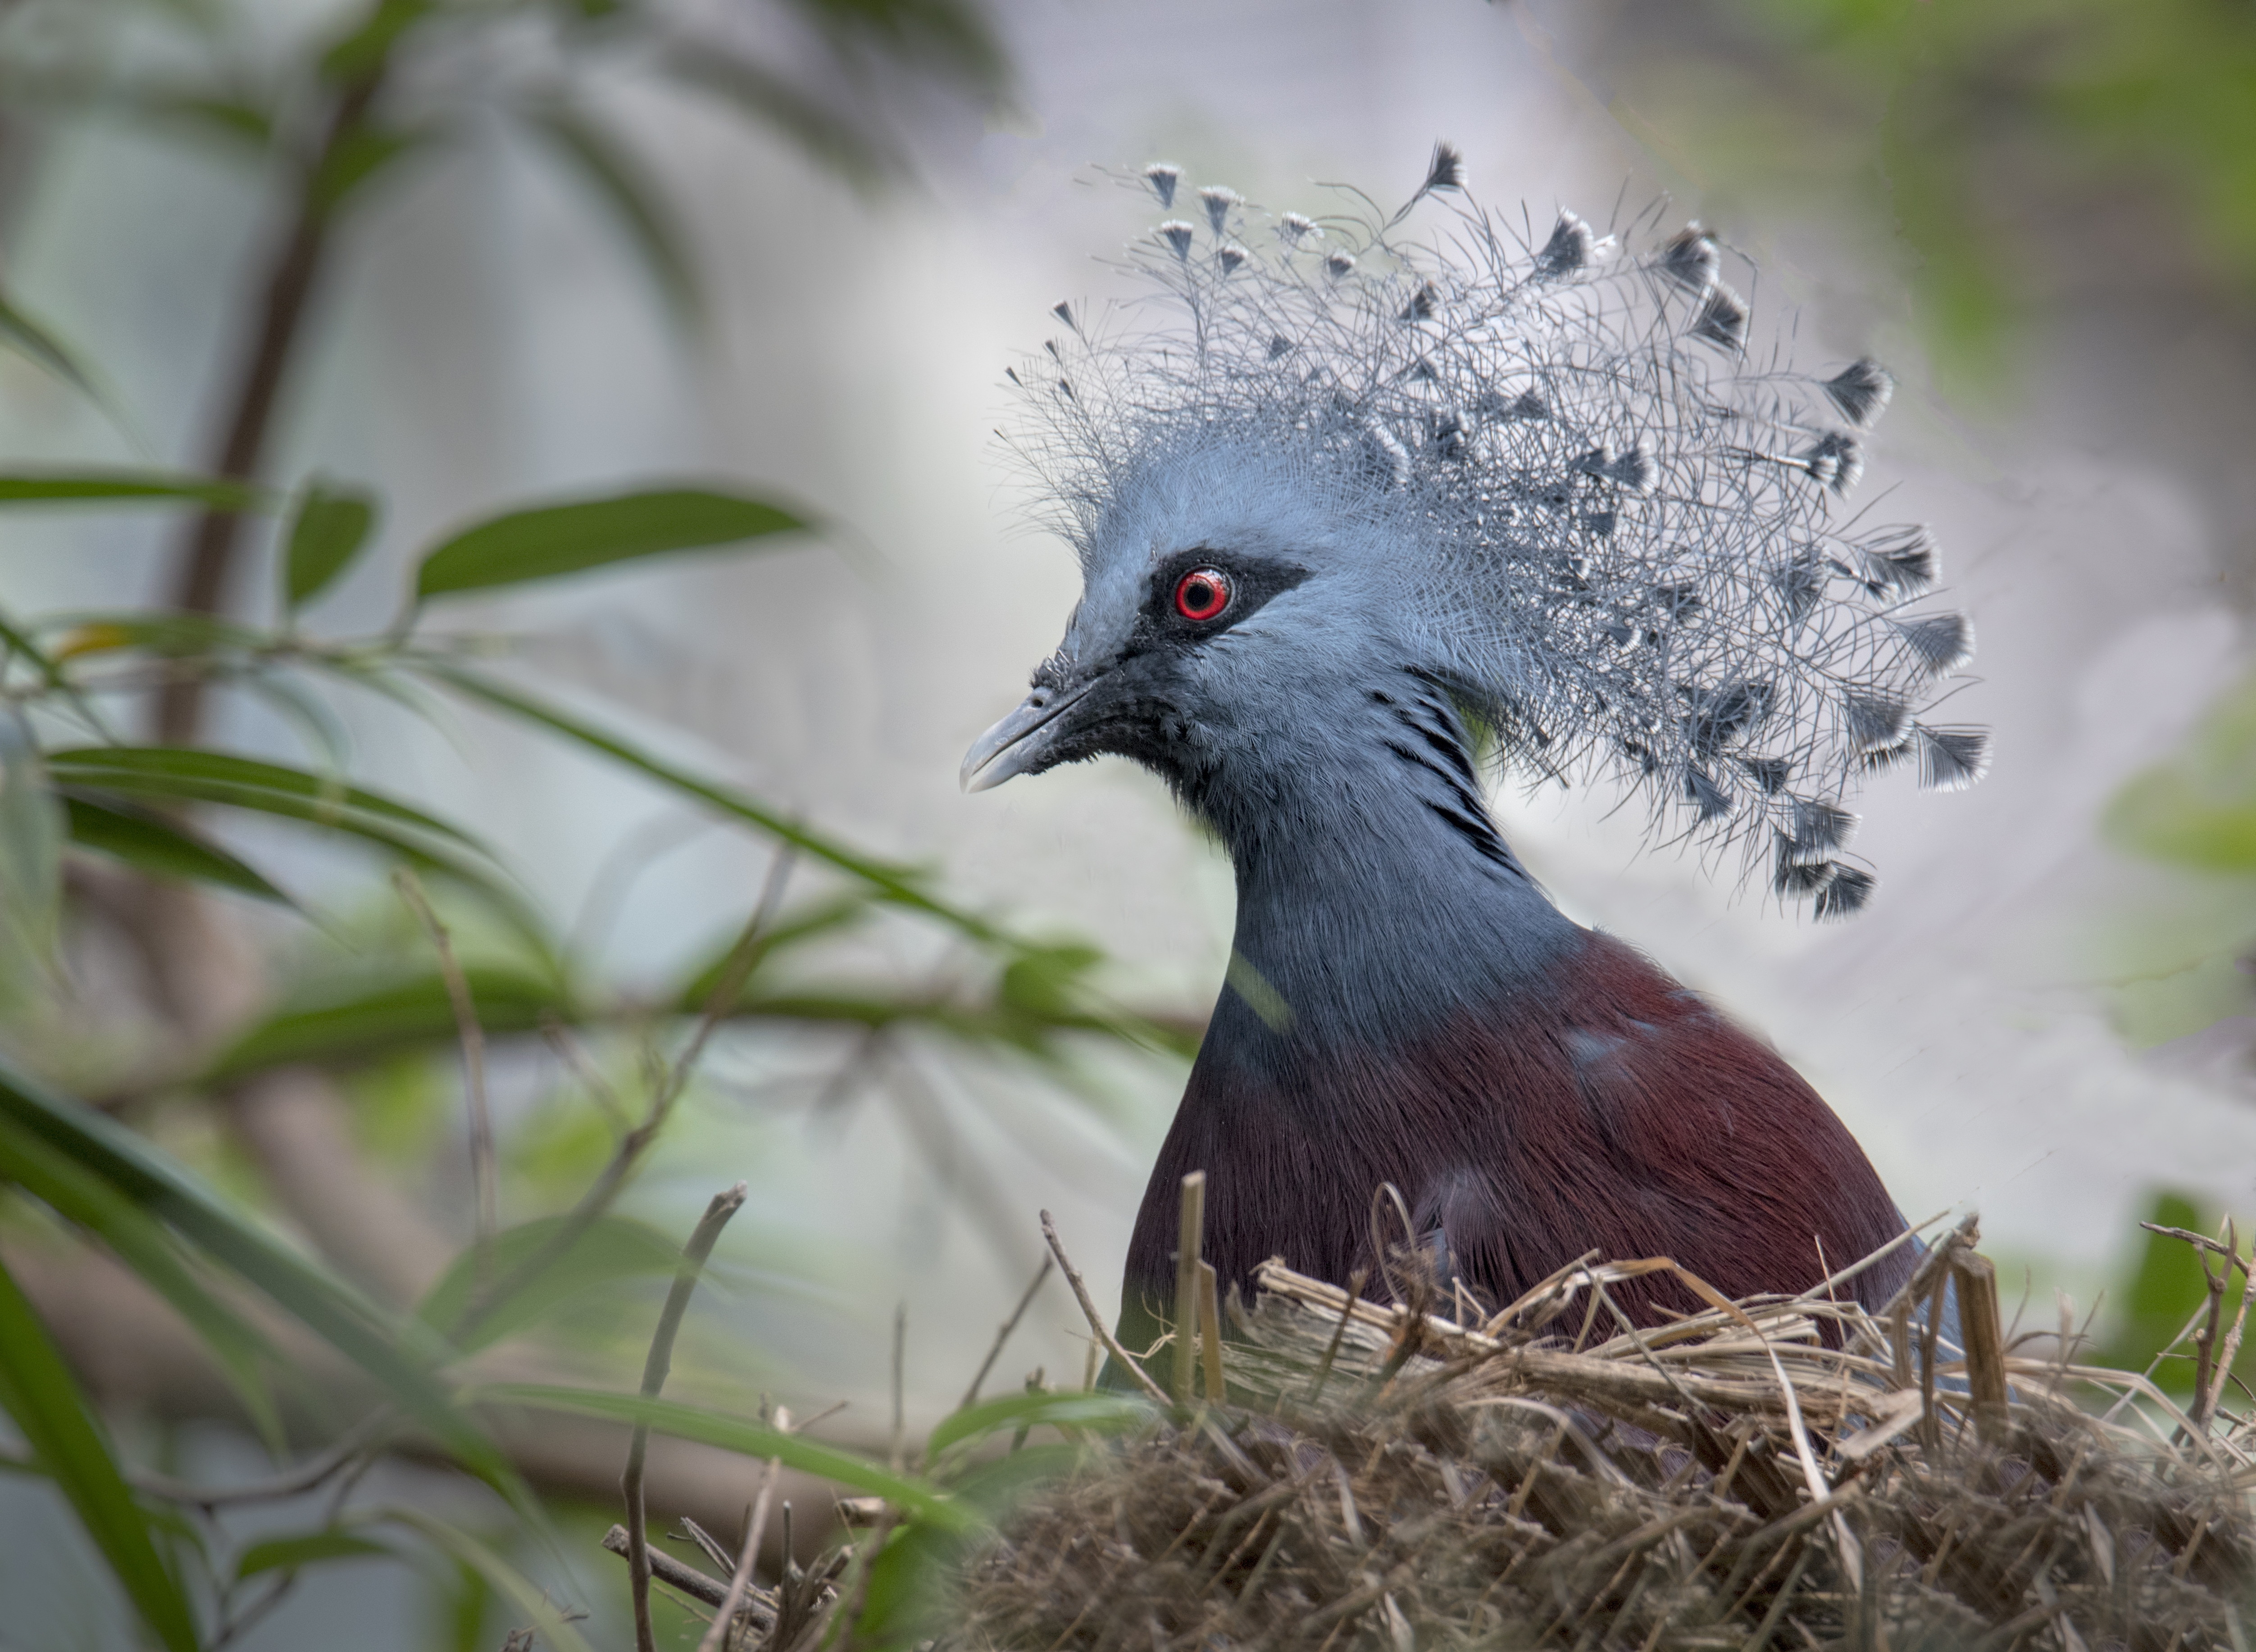 Blue-bird-red-eyes